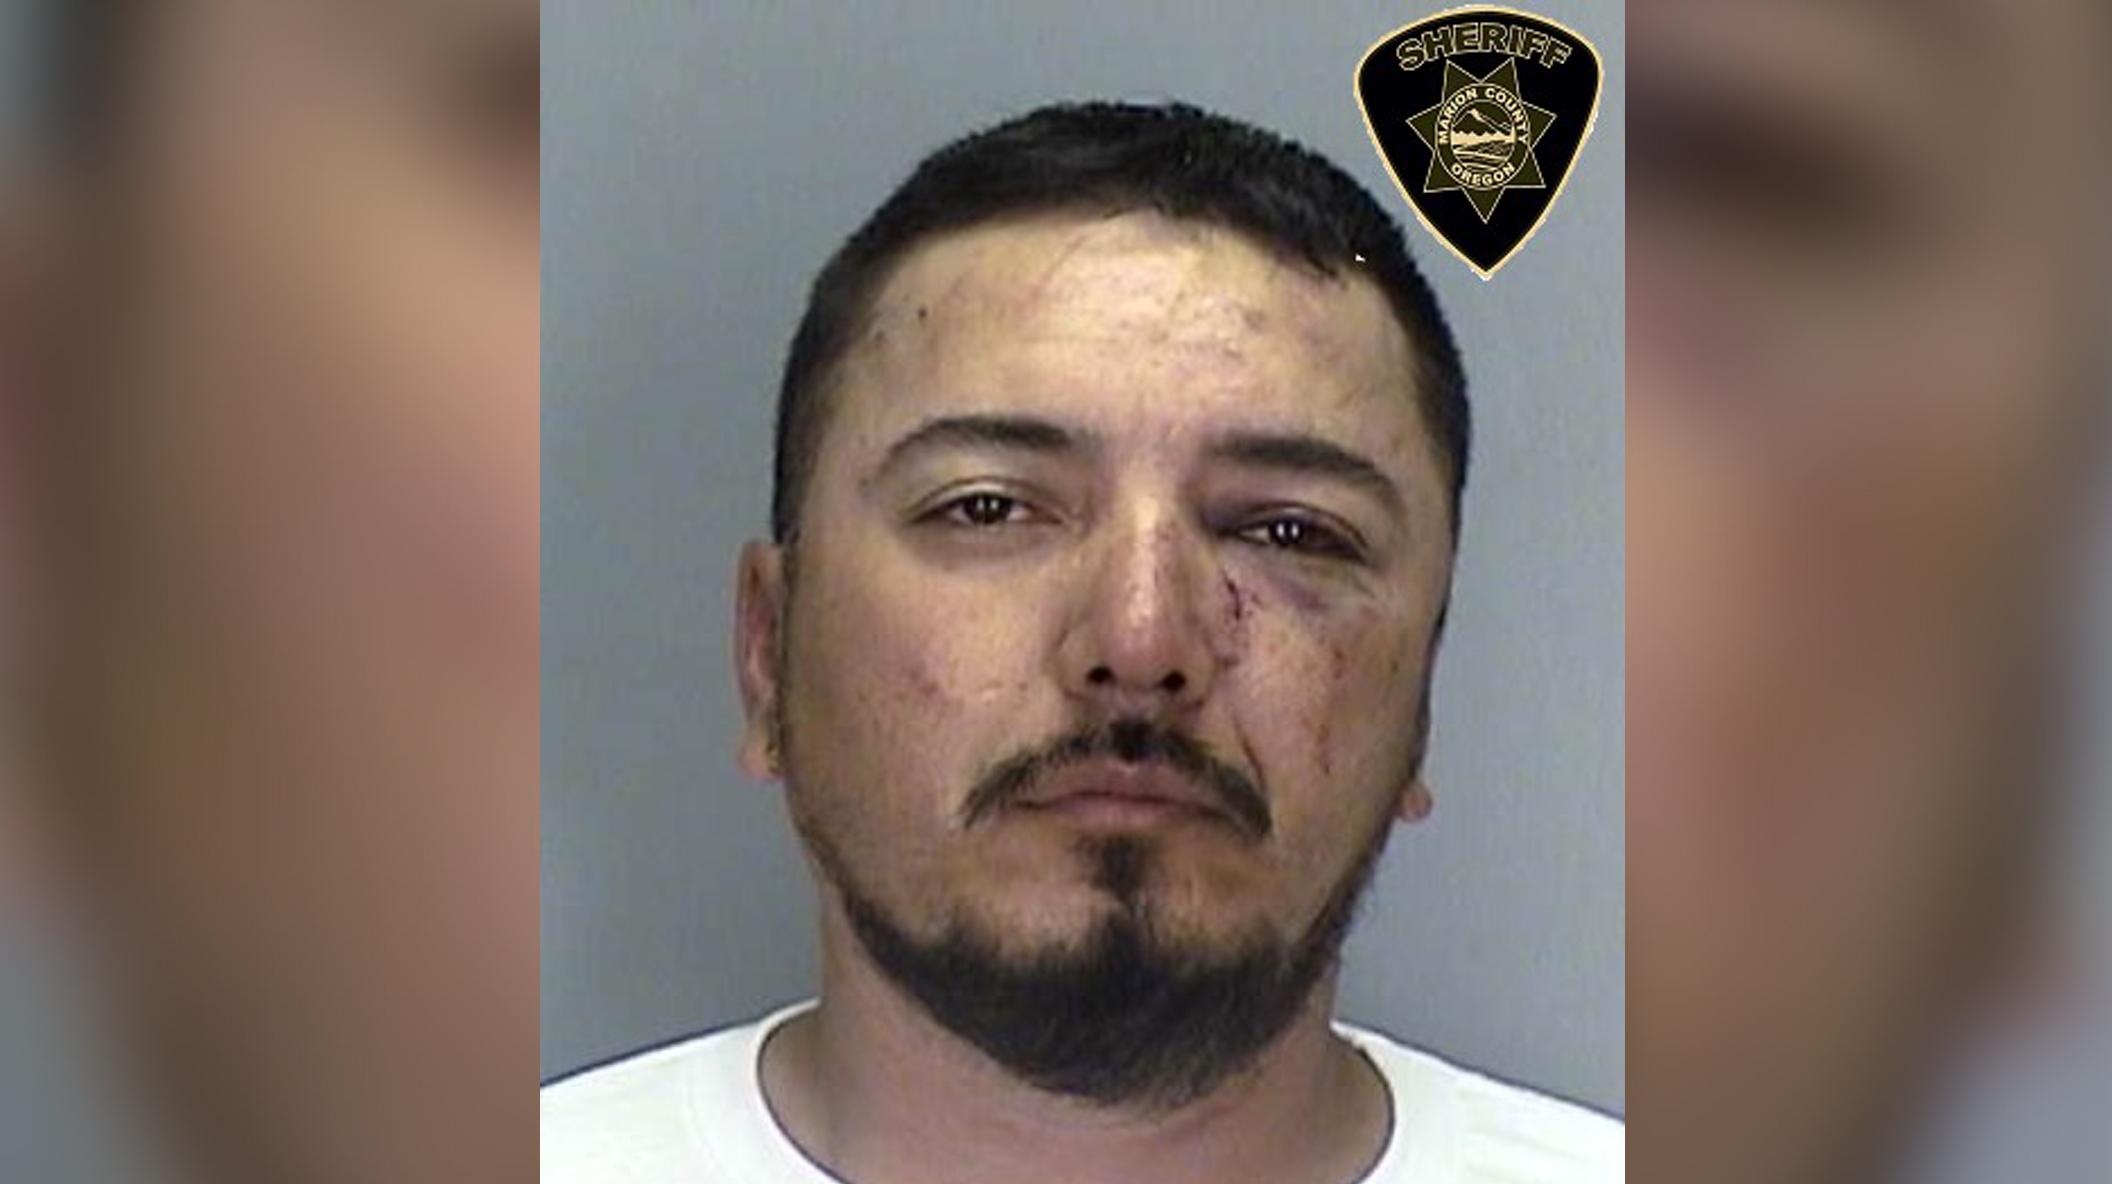 Man stabbed 7-8 times near Burnside Bridge | KOIN com